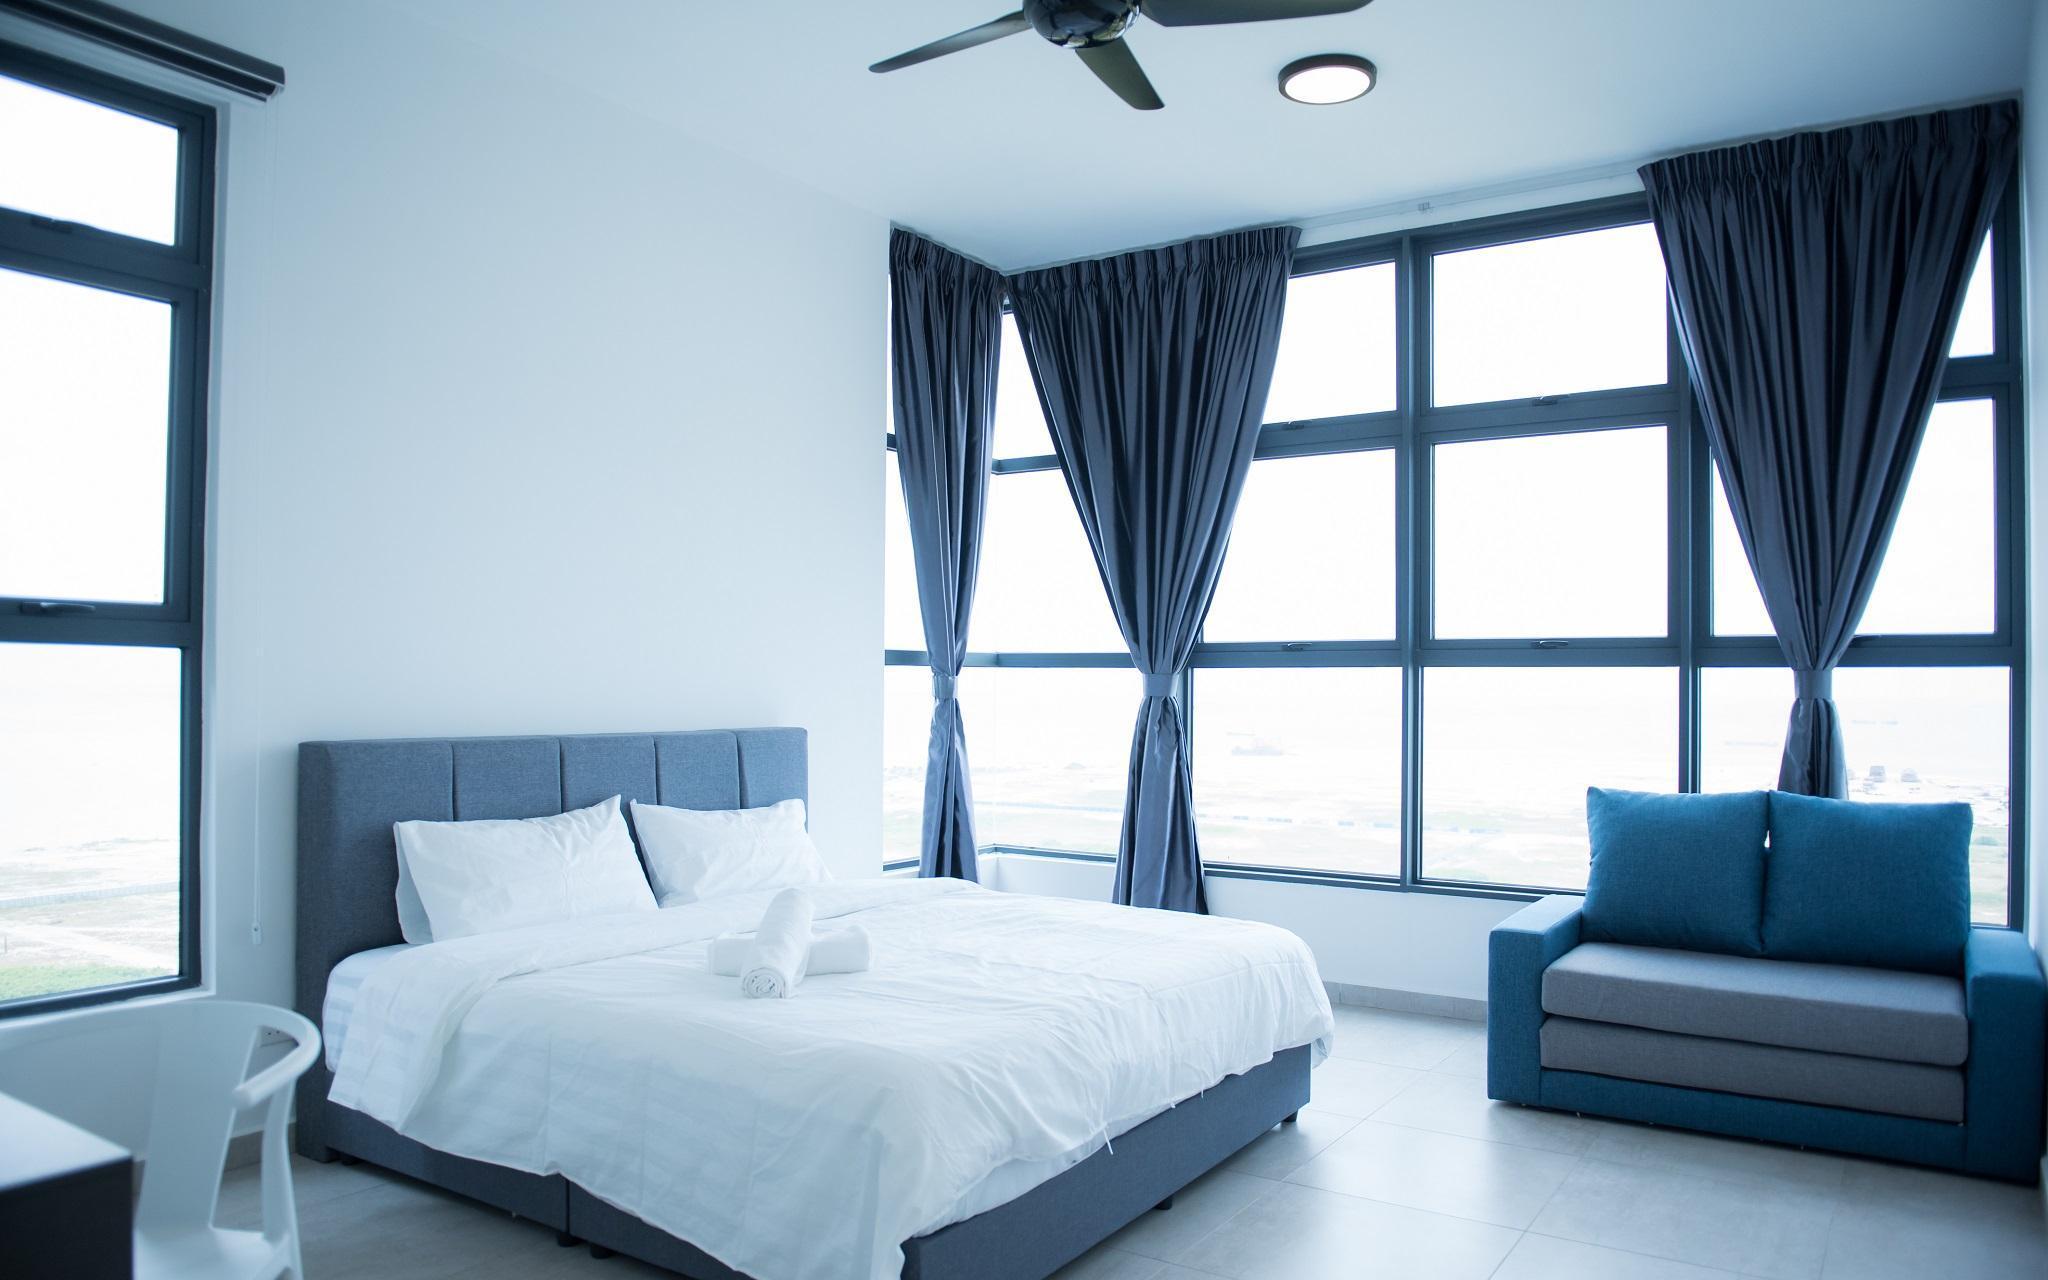 Atlantis 2 Bedroom  SeaView TVBox Jonker 8pax